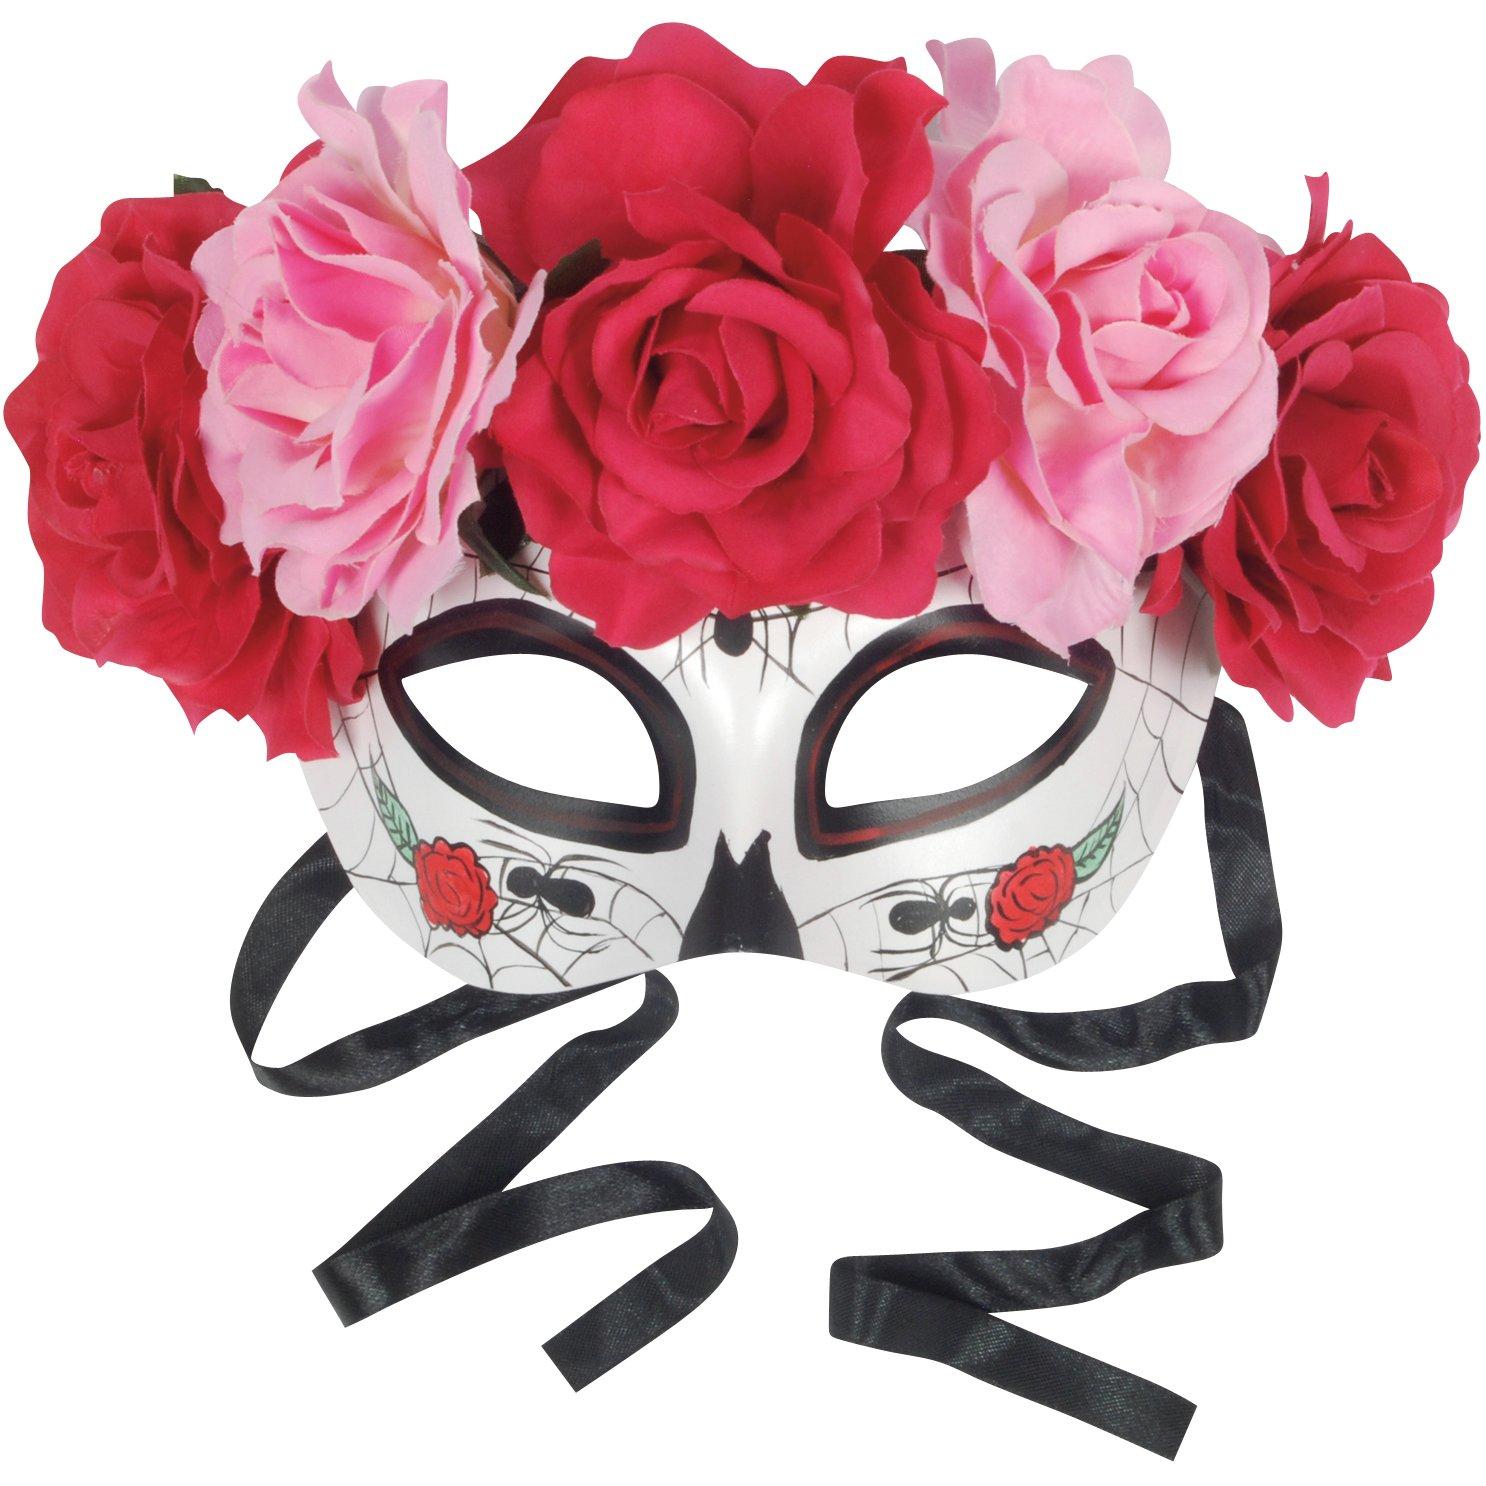 Loftus International Star Power Day of The Dead Sugar Skull Half Mask W Roses, White Multi, One-Size Novelty Item by Loftus International